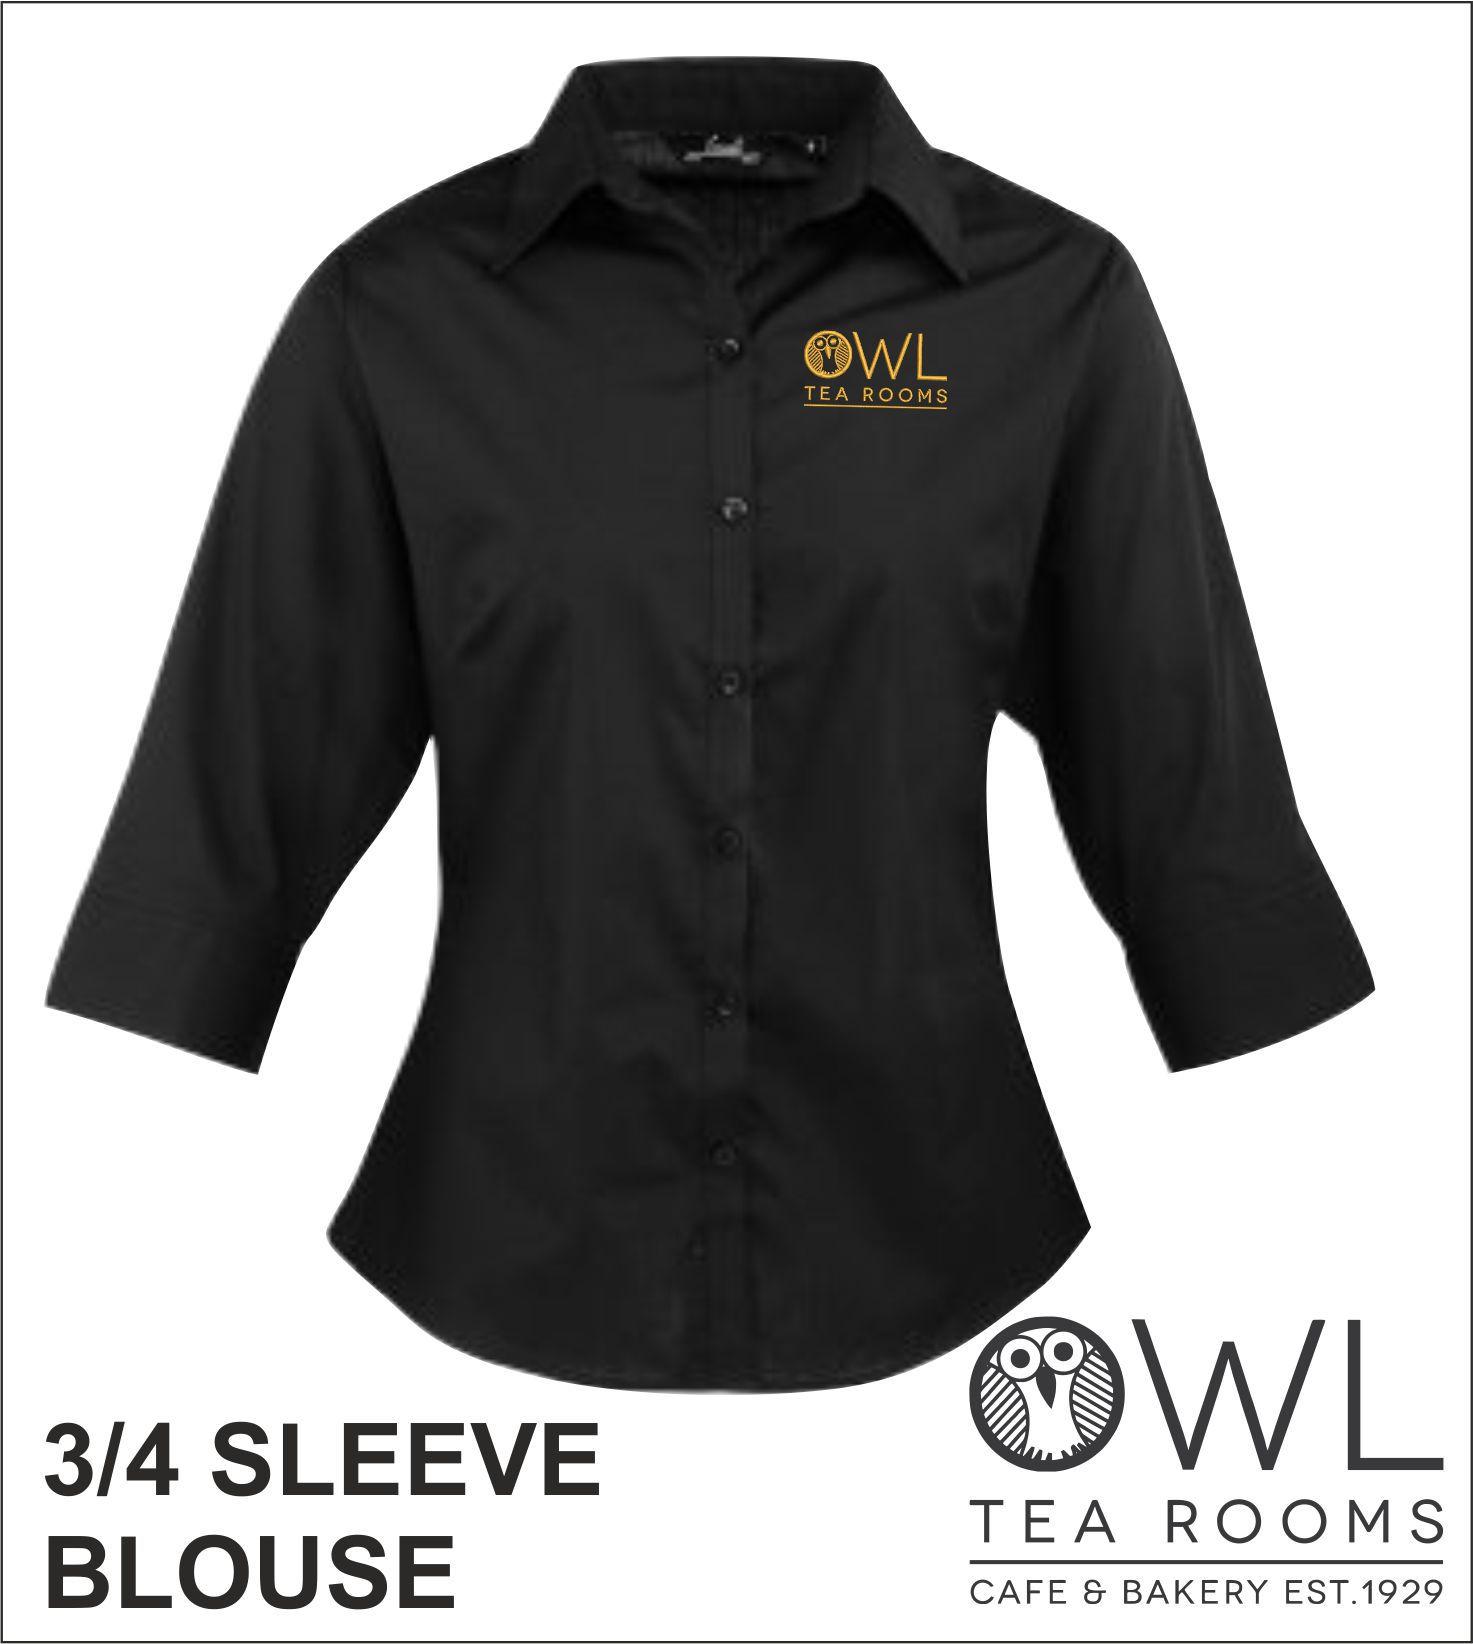 3Q Sleeve Blouse